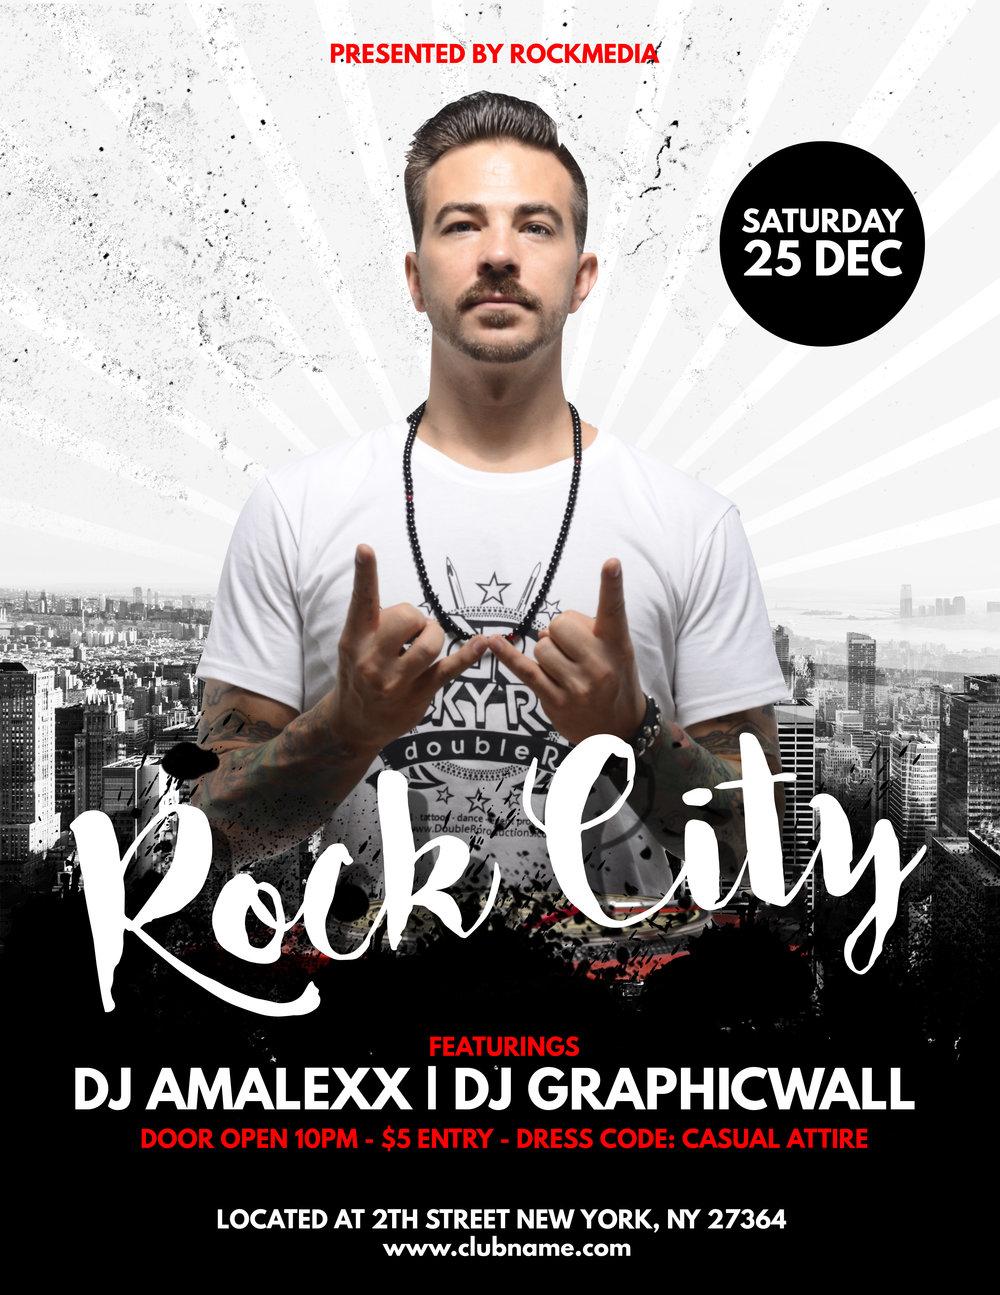 Copy of Rock City Flyer.jpg